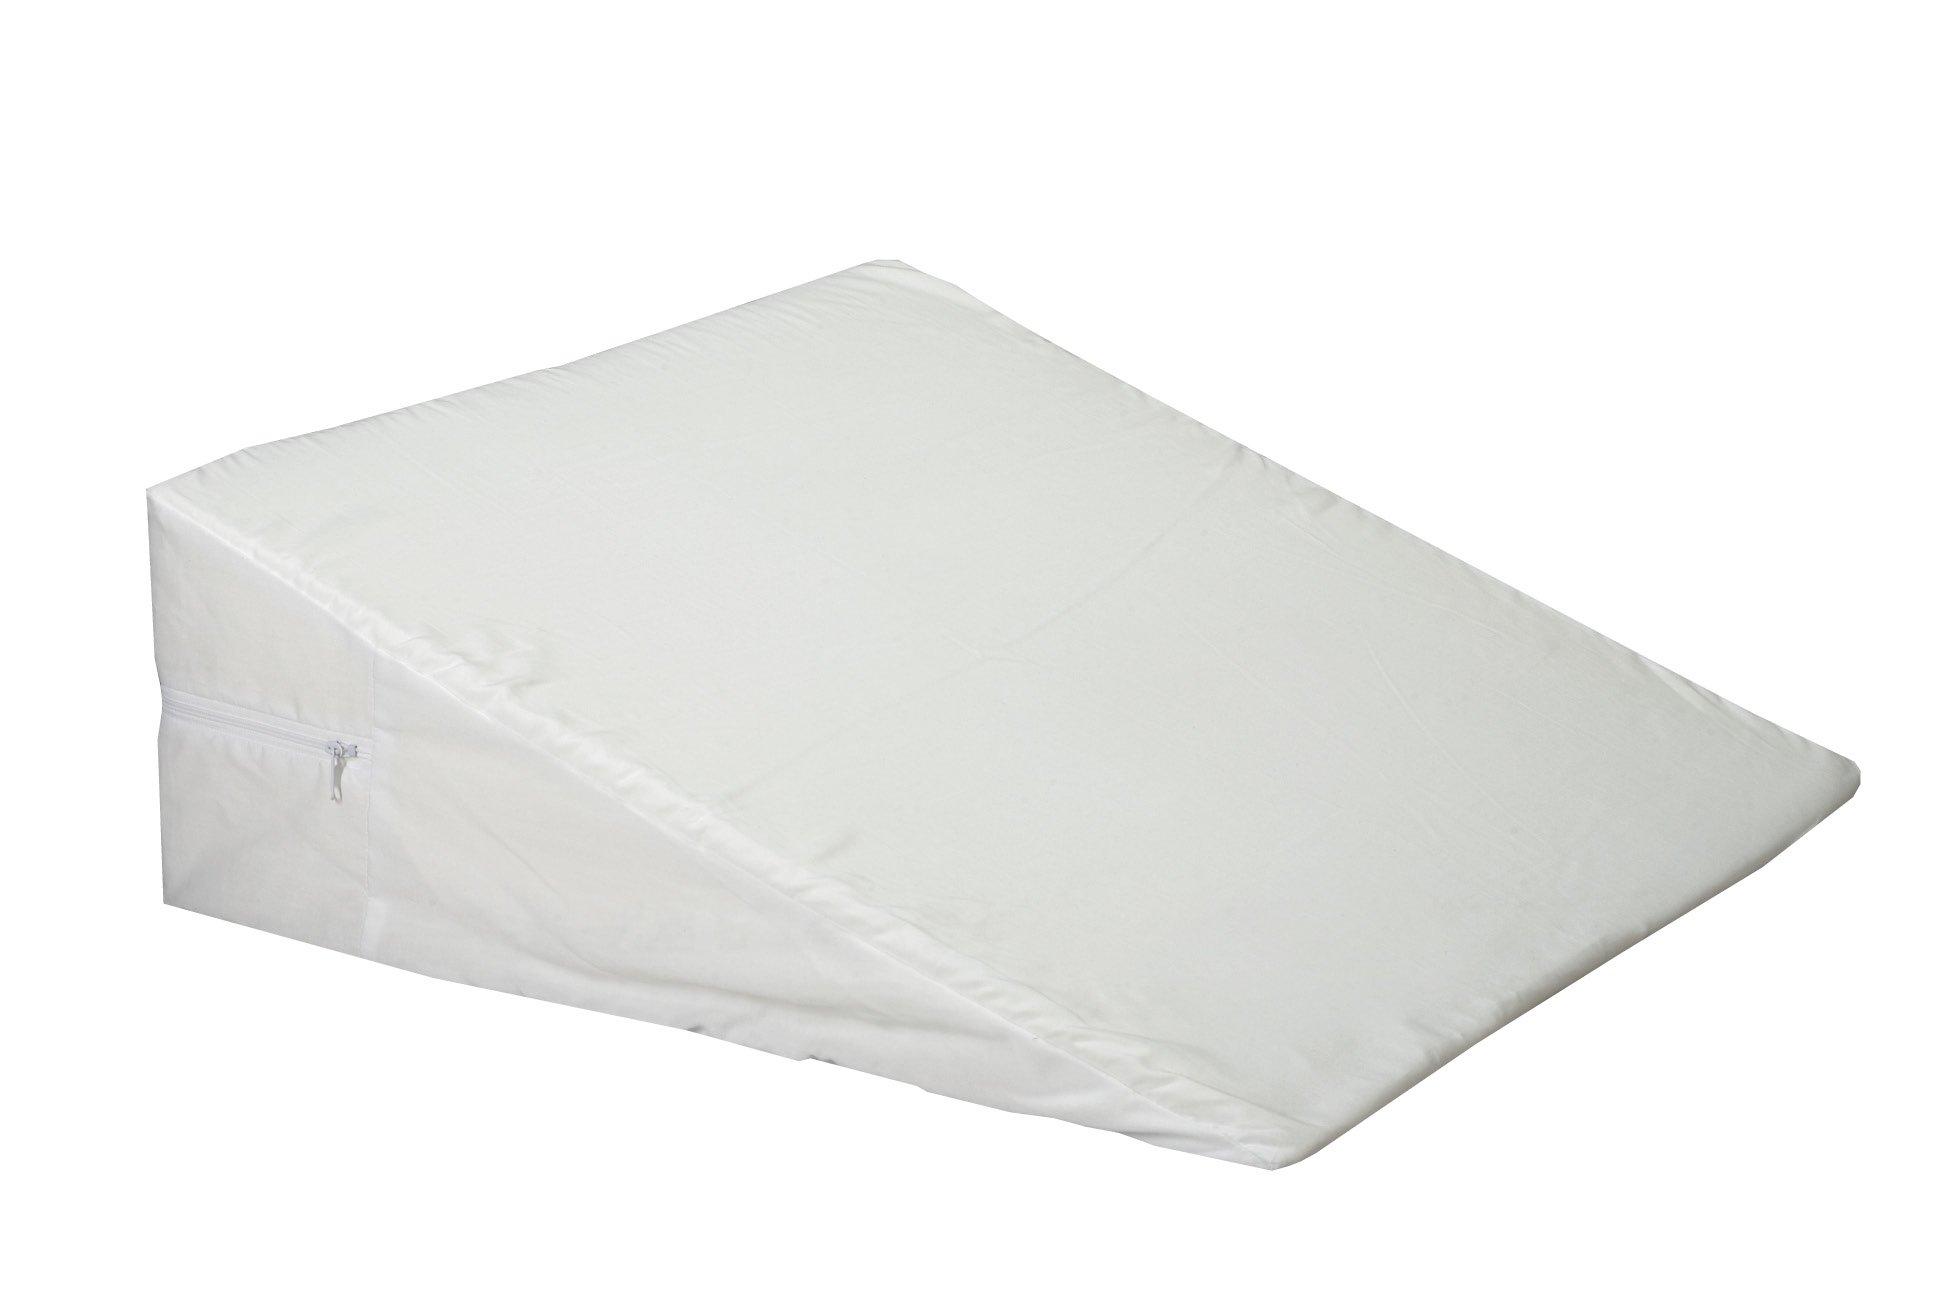 Bilt-Rite Mastex Health FW102 Bed Wedge, White